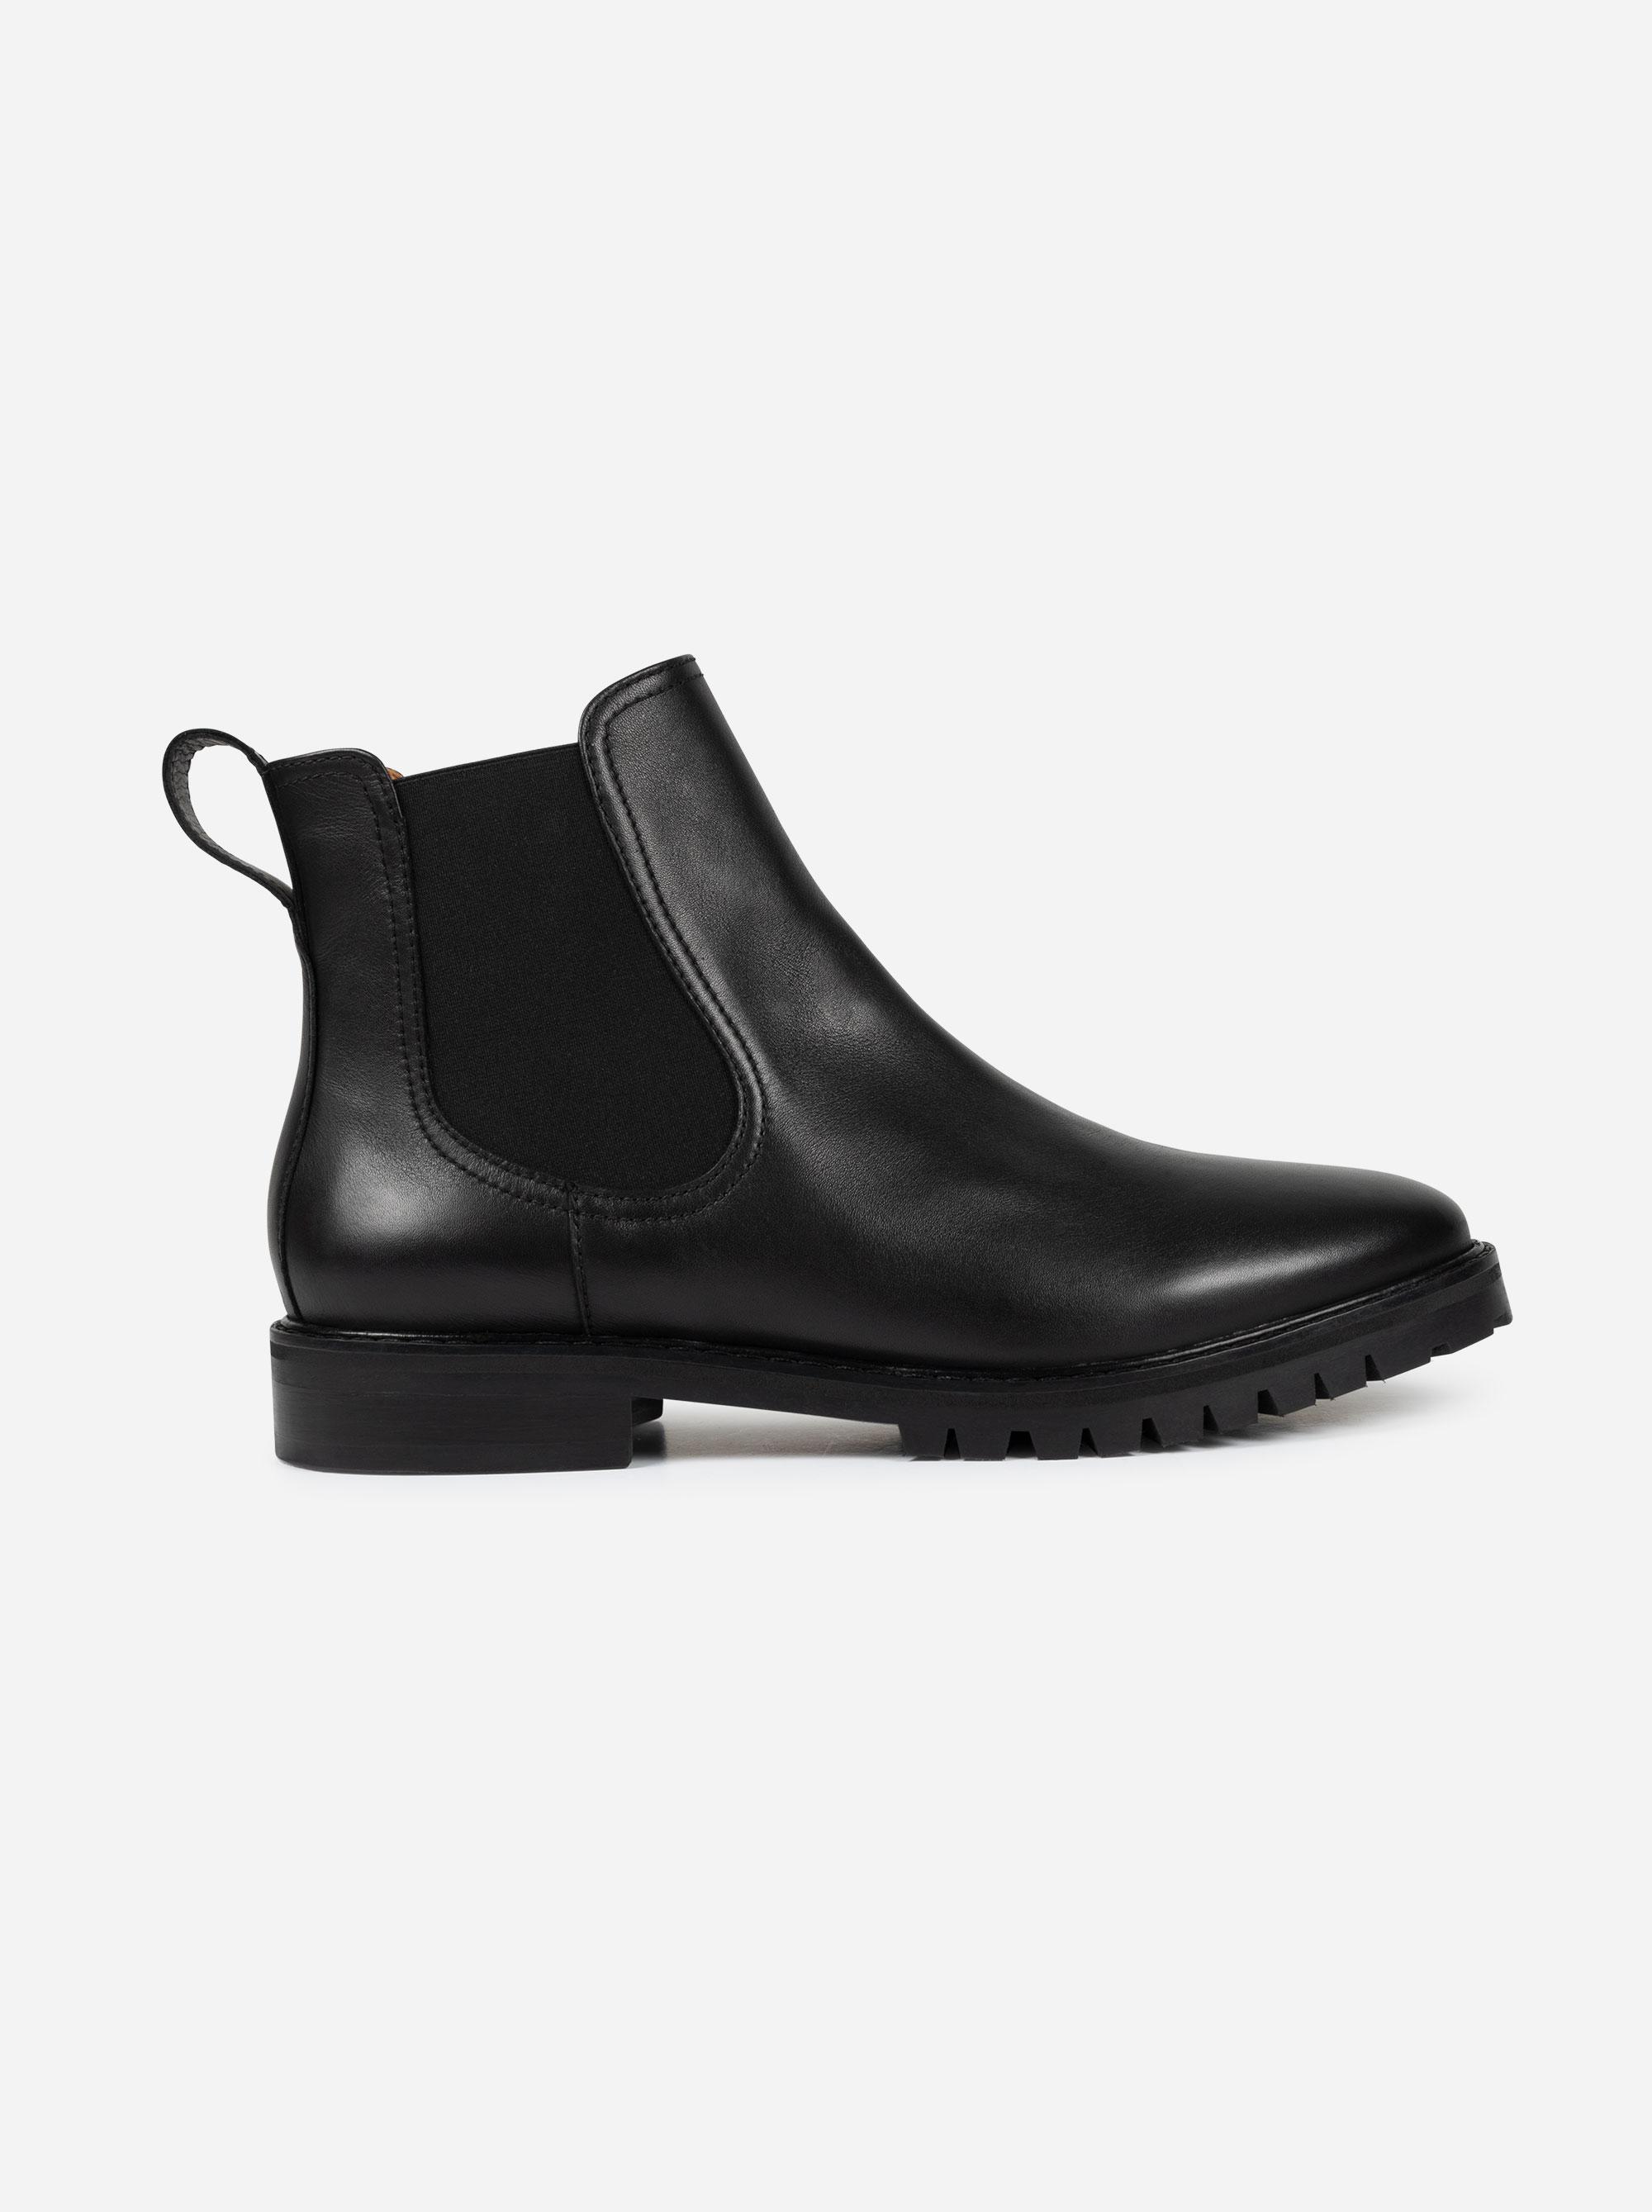 Teym - The Chelsea Boot - Black - 0